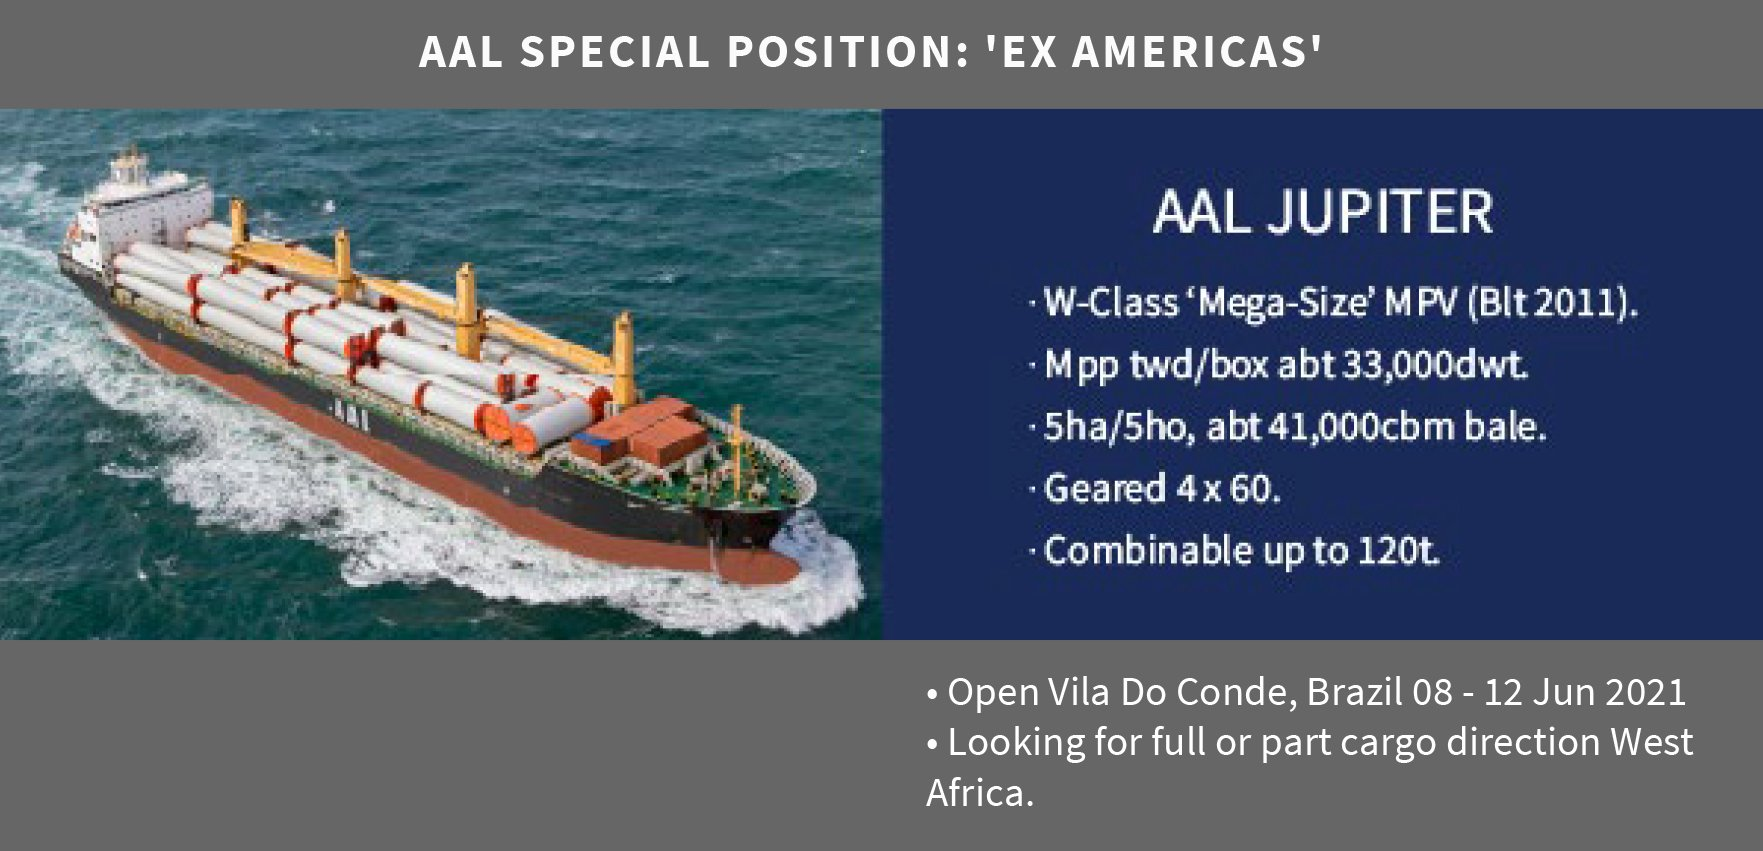 SPECIAL POSITION: 'EX AMERICAS' (04.06.21)